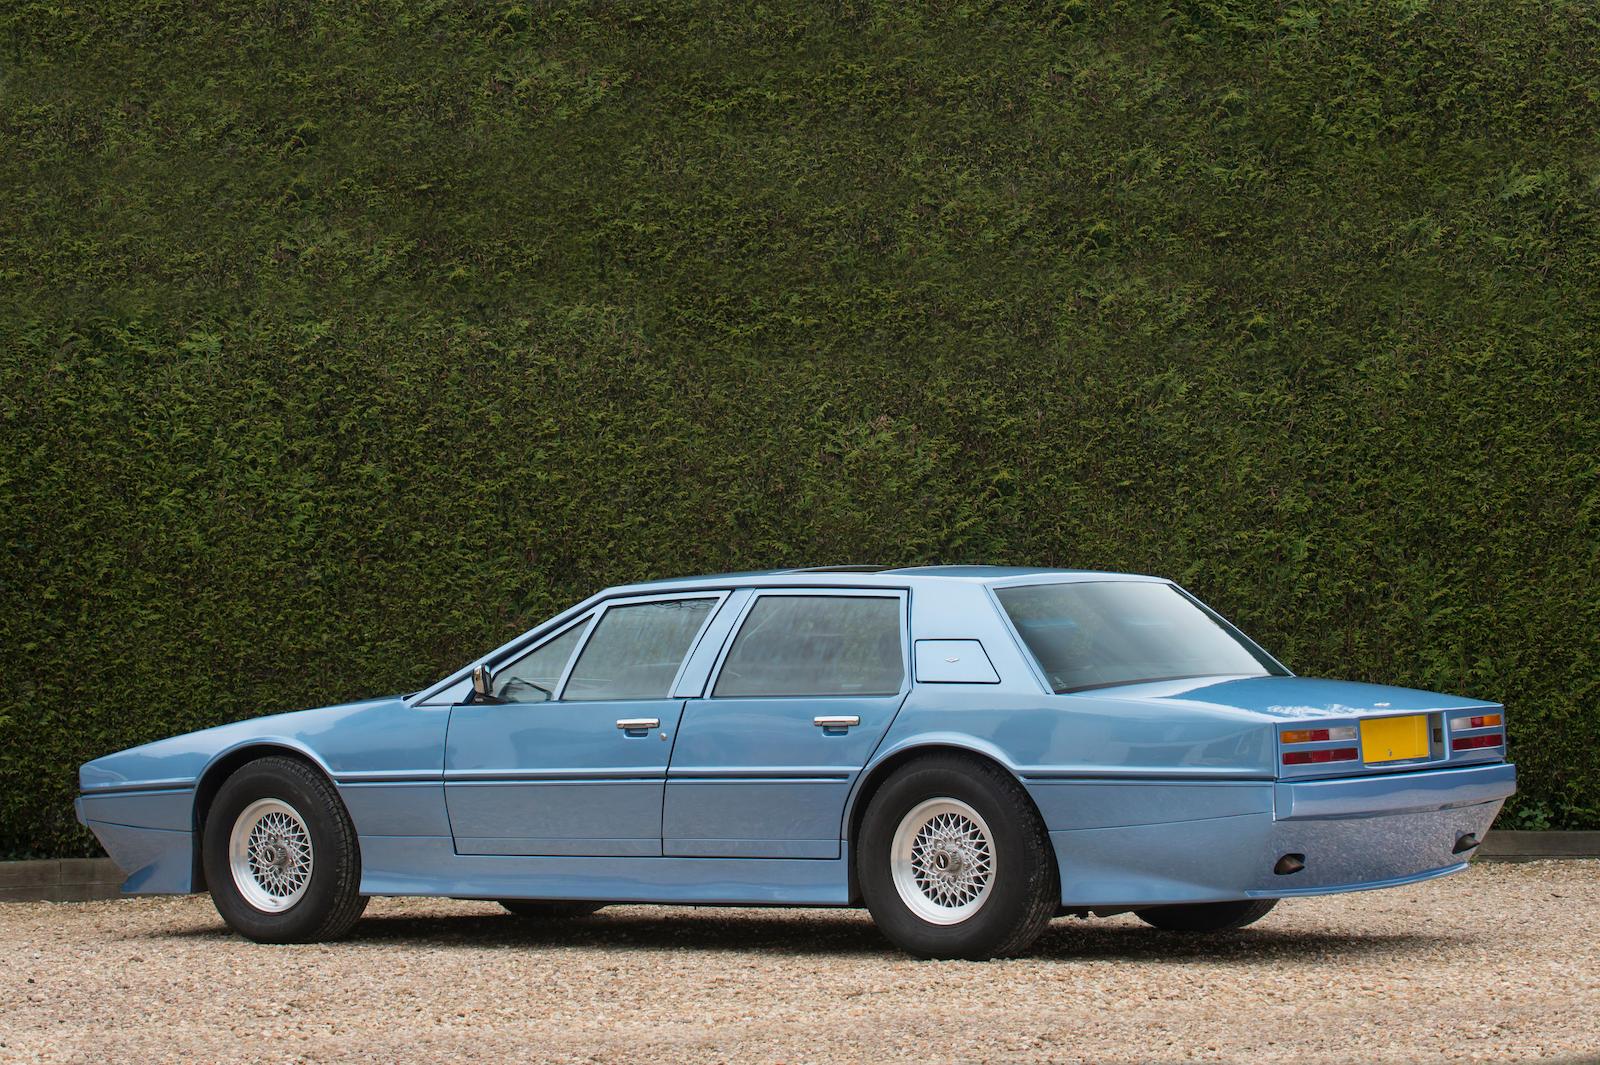 Aston Martin Lagonda Series 2 1980